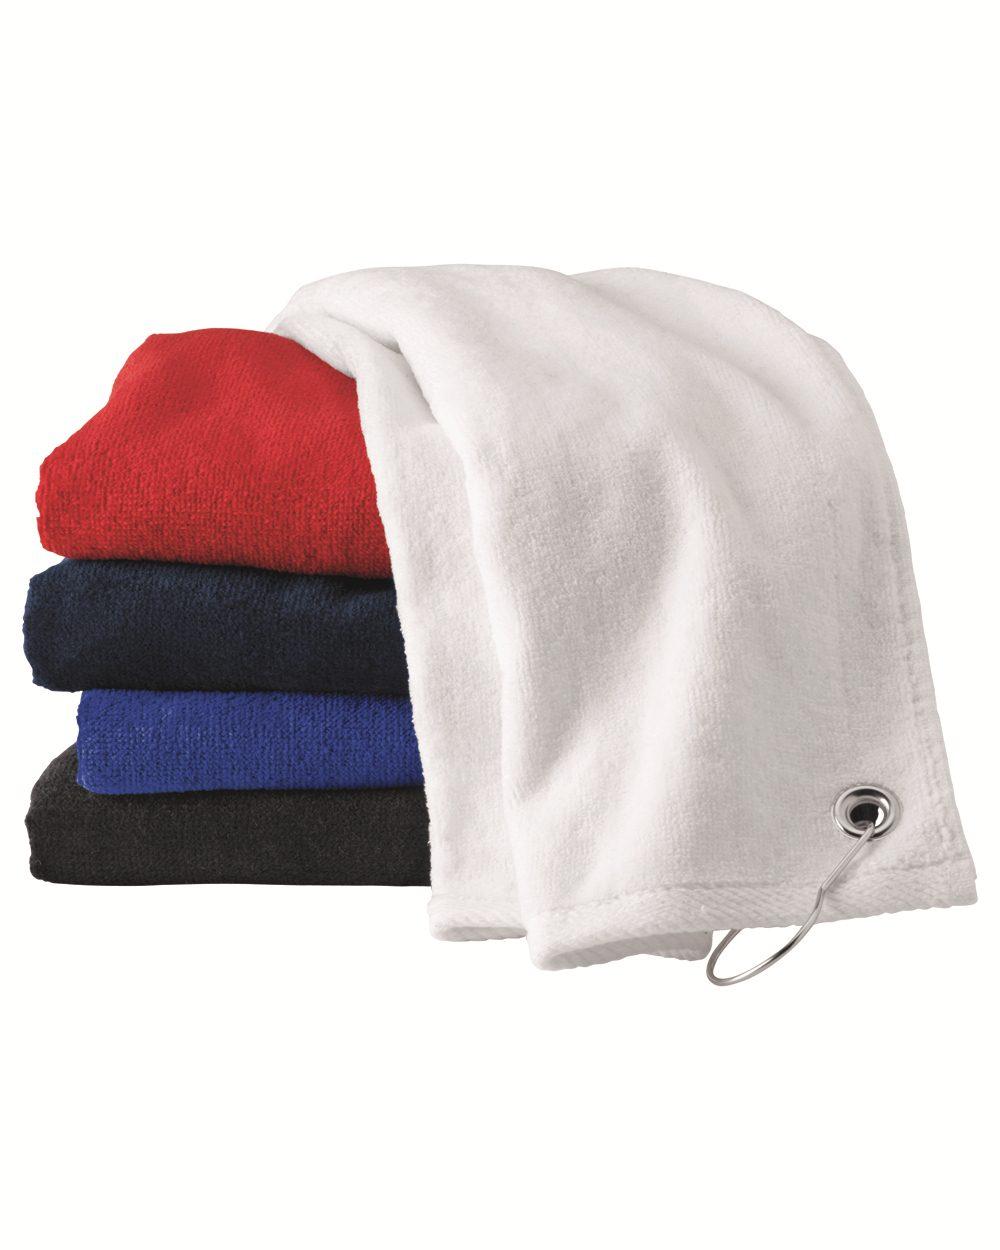 Carmel Towel Company C1518GH - Velour Hemmed Towel with ...